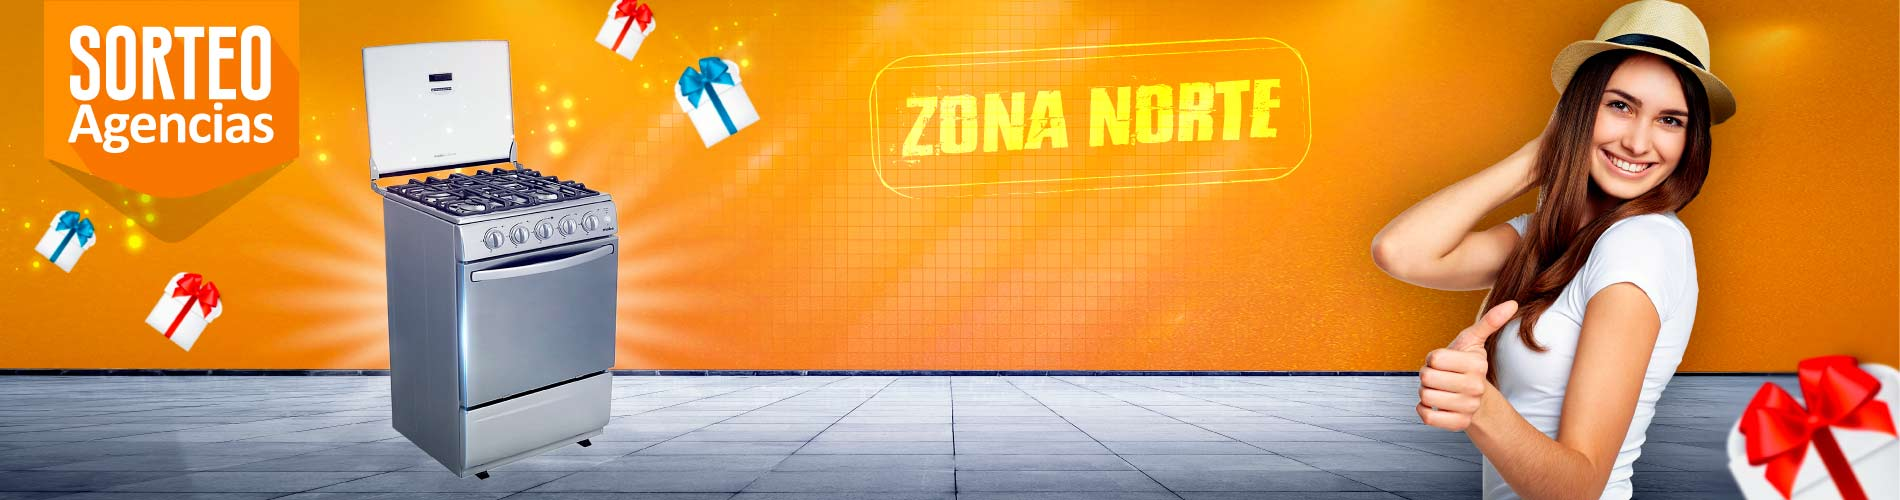 SORTEO ZONA NORTE